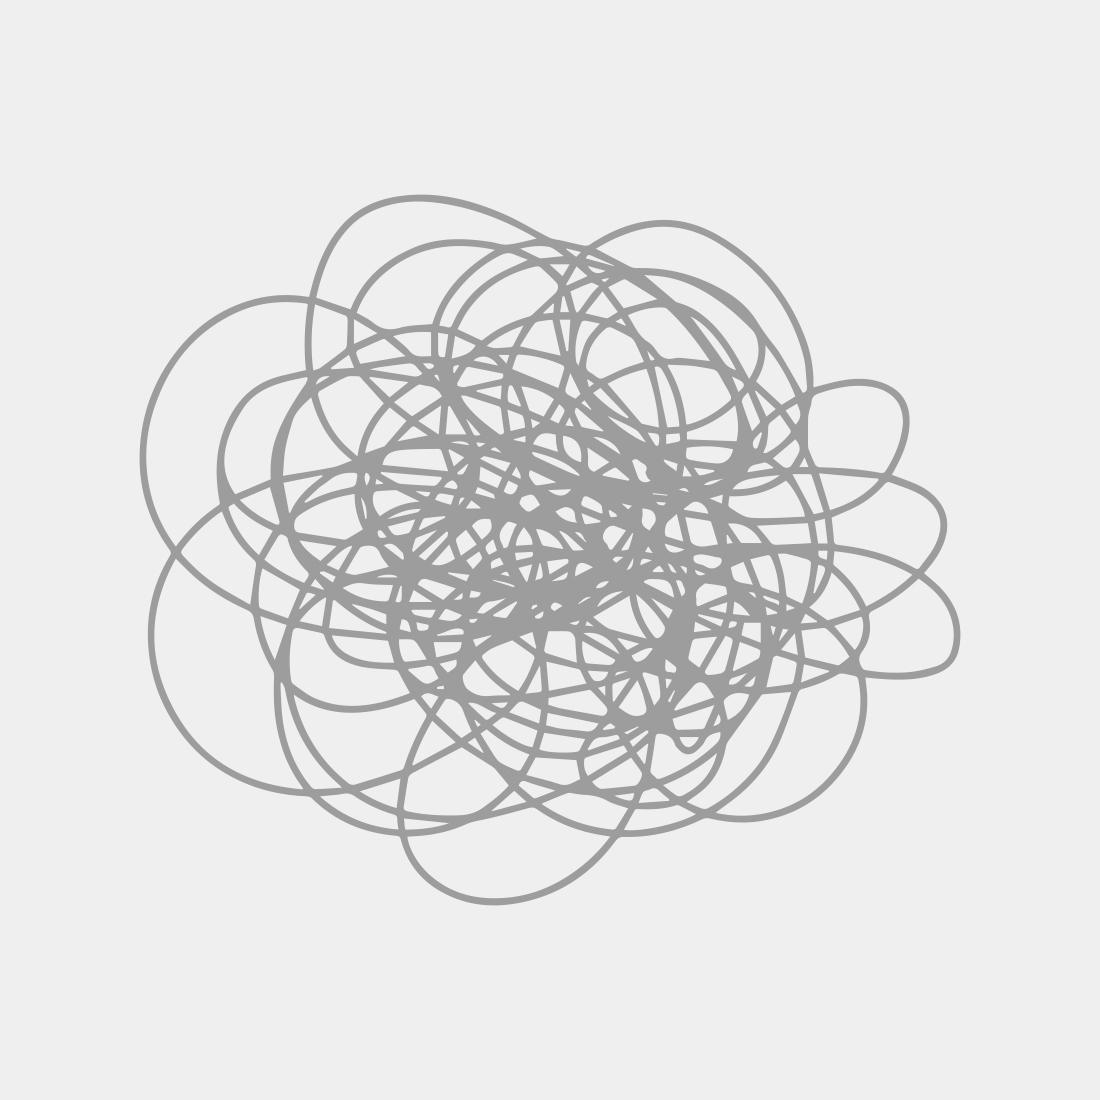 3D Printed Red Bracelet